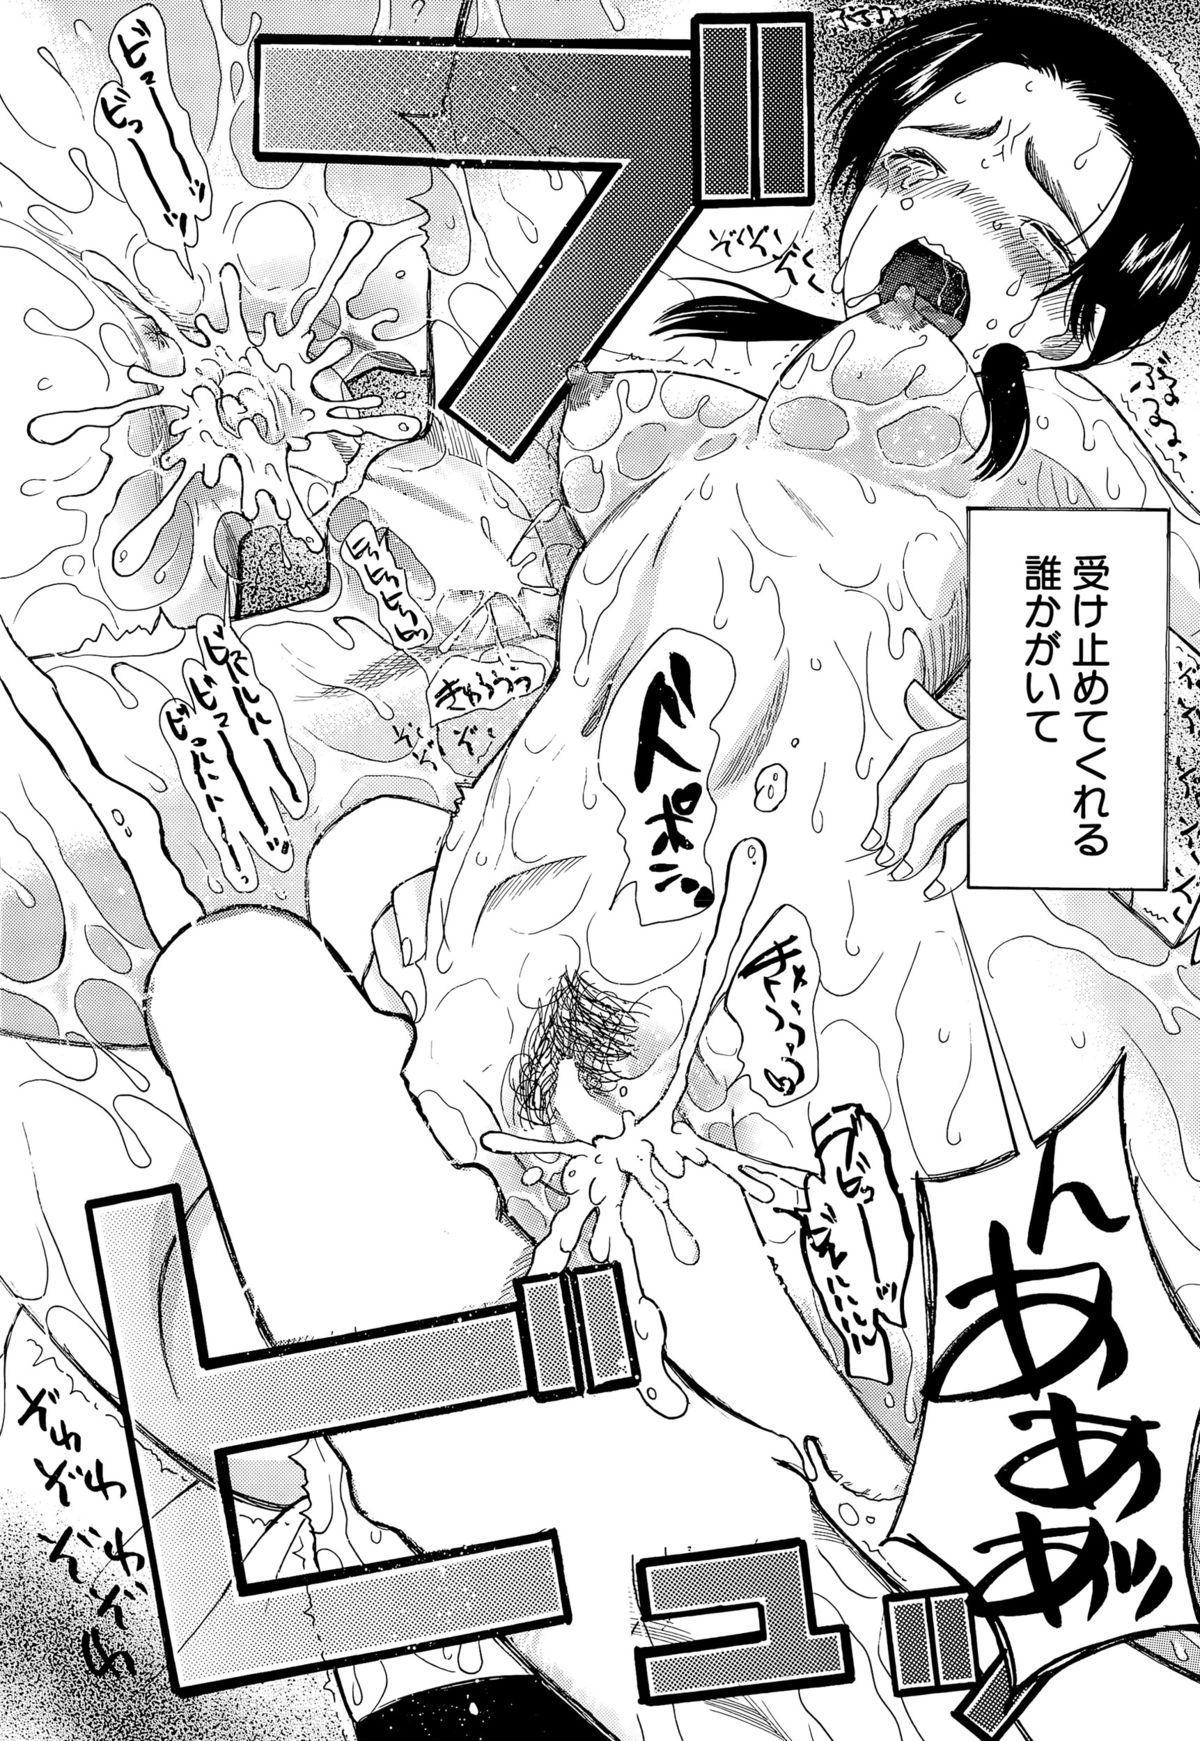 Kawaiku Natte Omocha ni Natte 149